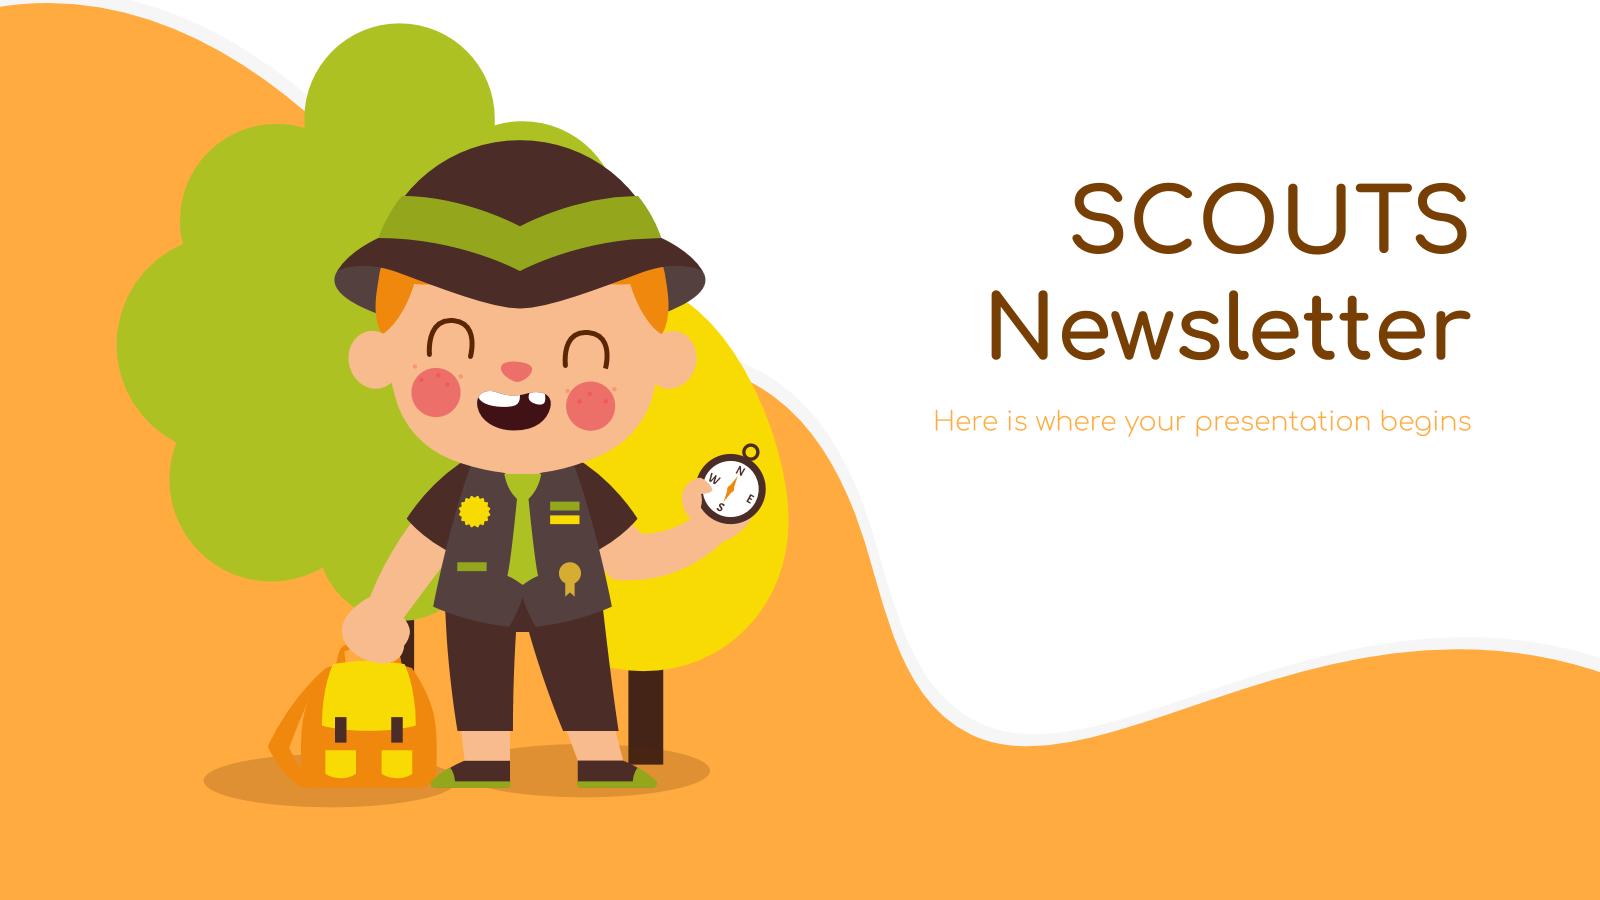 Plantilla de presentación Newsletter para scouts